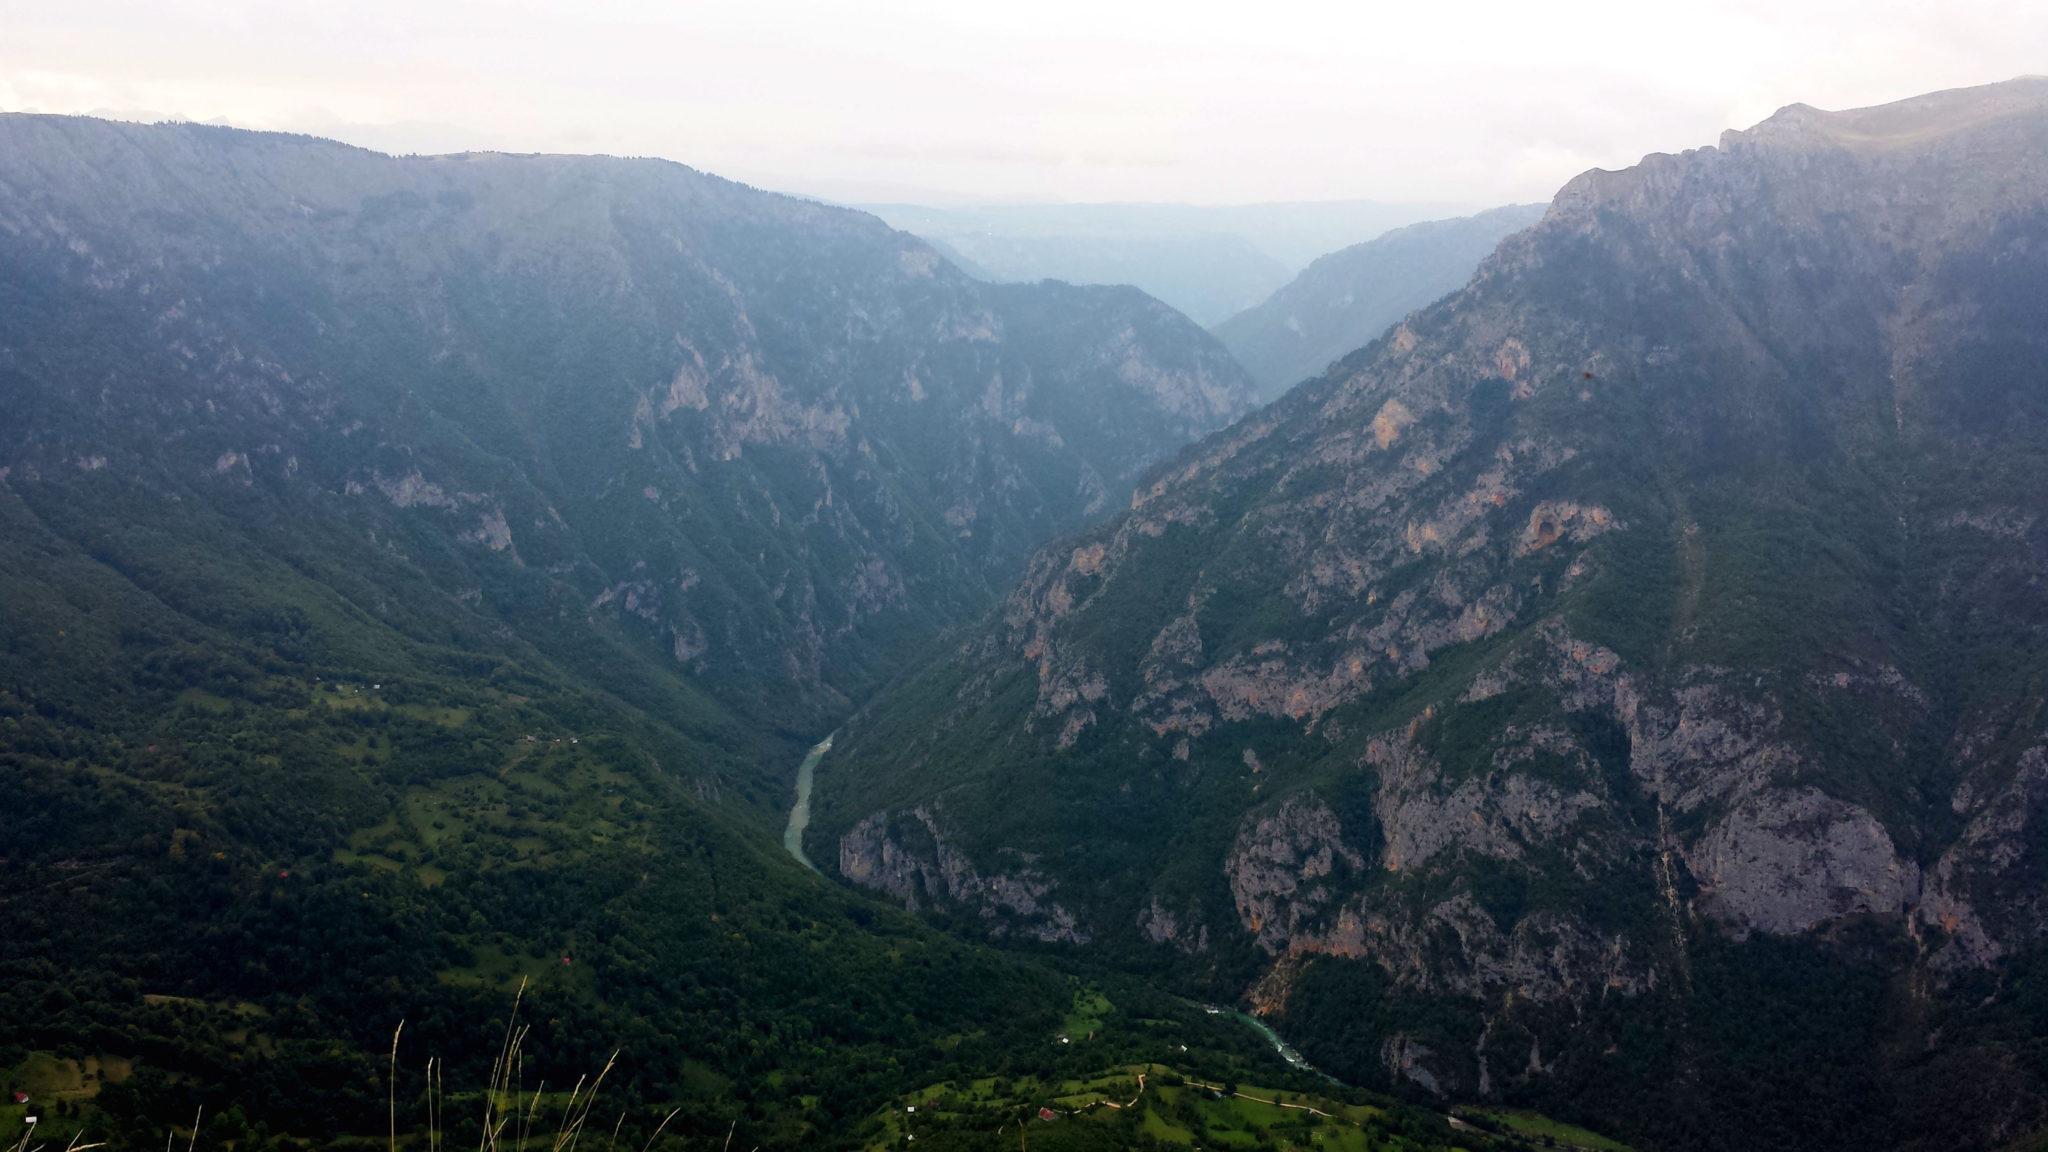 Hemaposesesvalises_montenegro_la_randonnee_champignon_voyage_travel_blog9